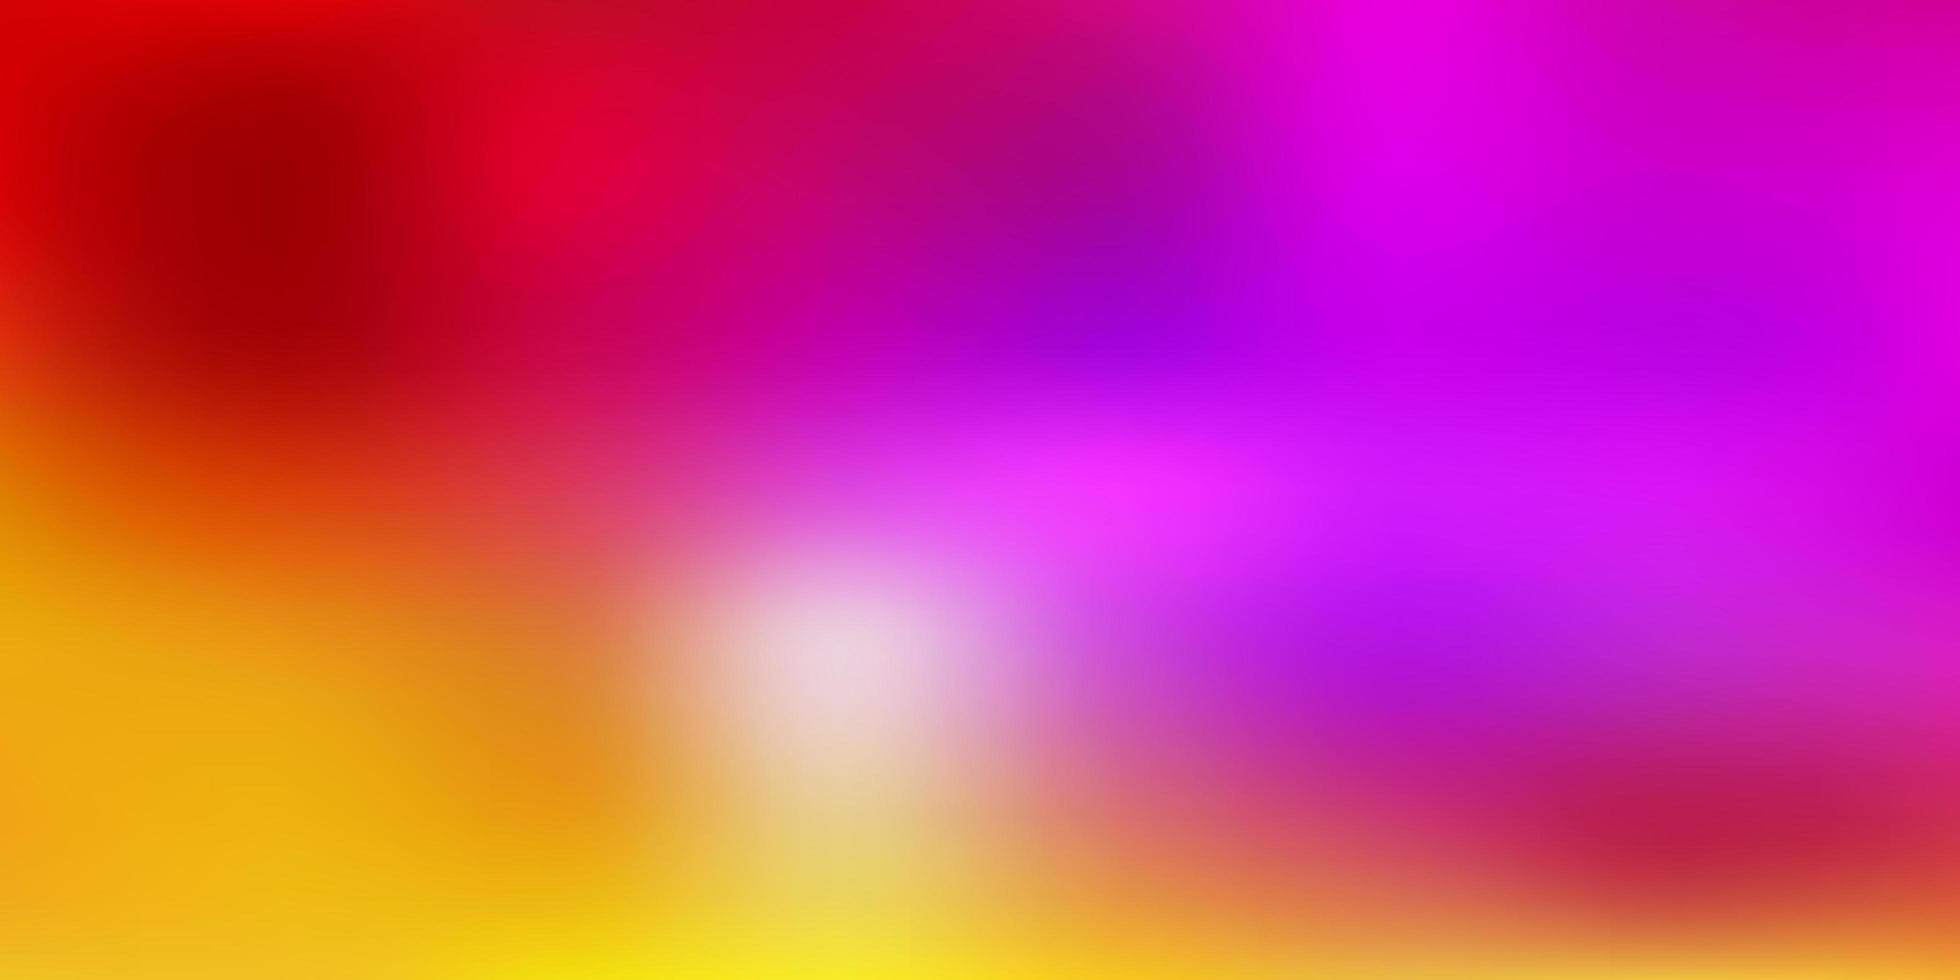 textura turva luz multicolor vetor. vetor